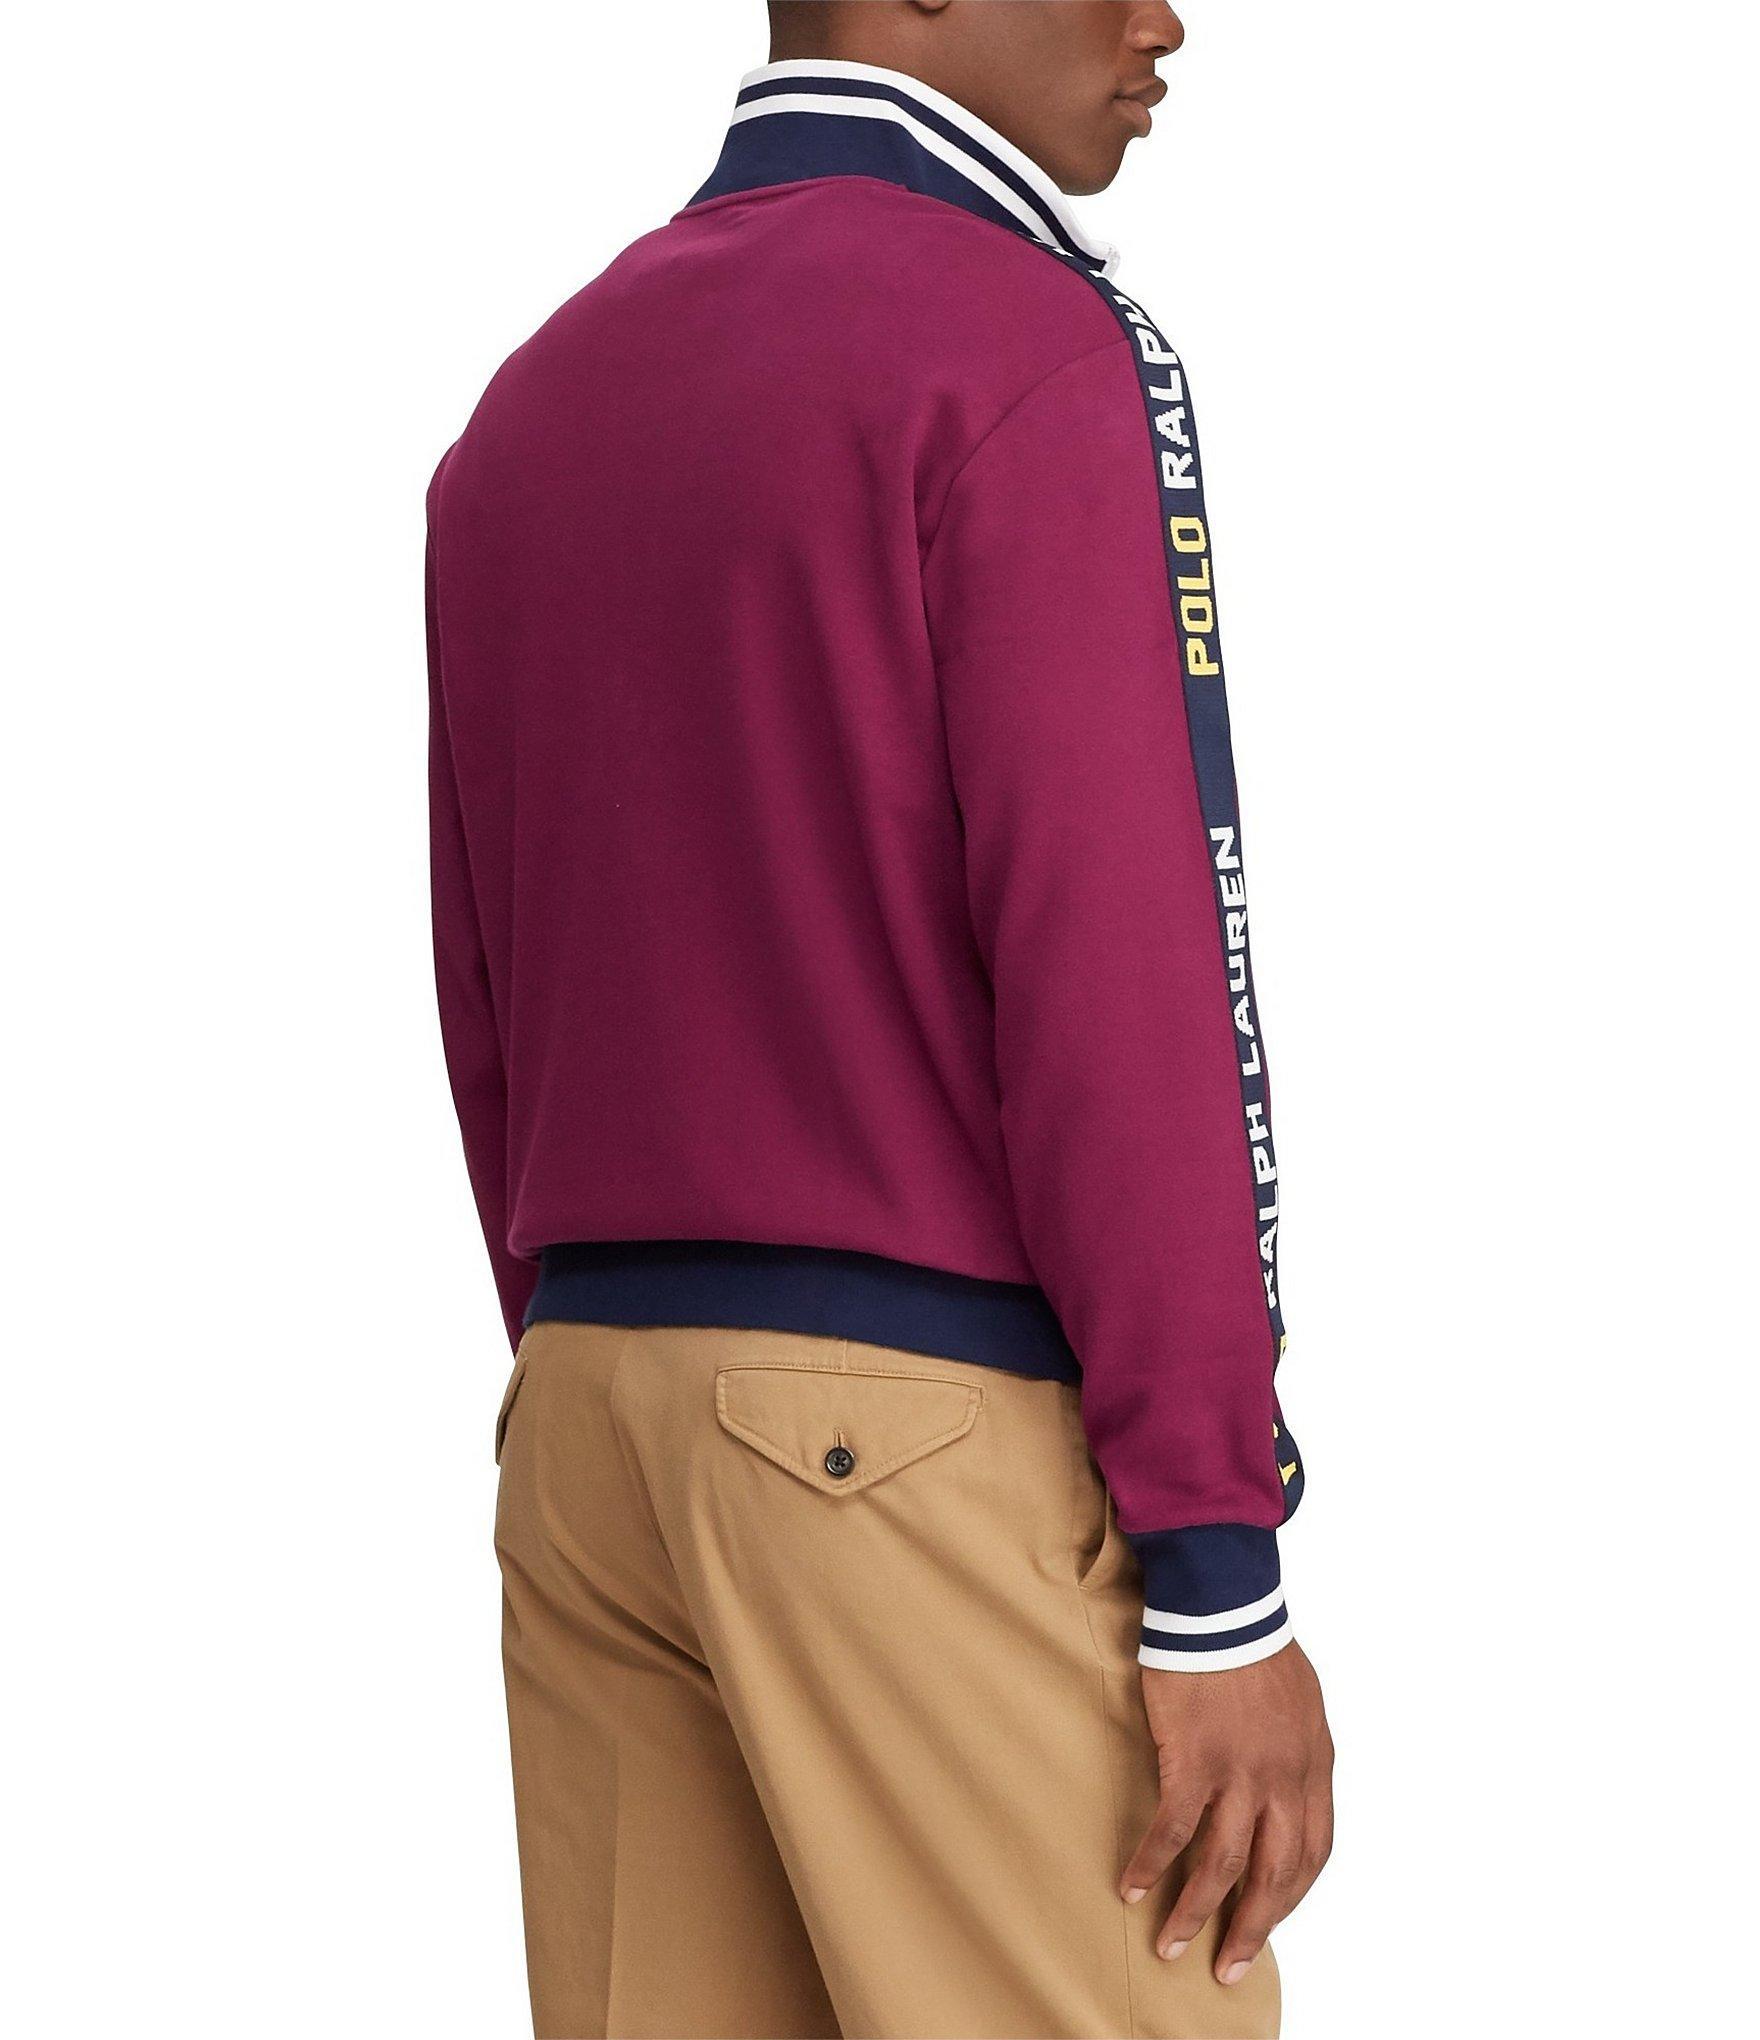 NWT Ralph Lauren Mens LS Classic Wine Bayport Windbreaker Jacket Sz S L NEW $145